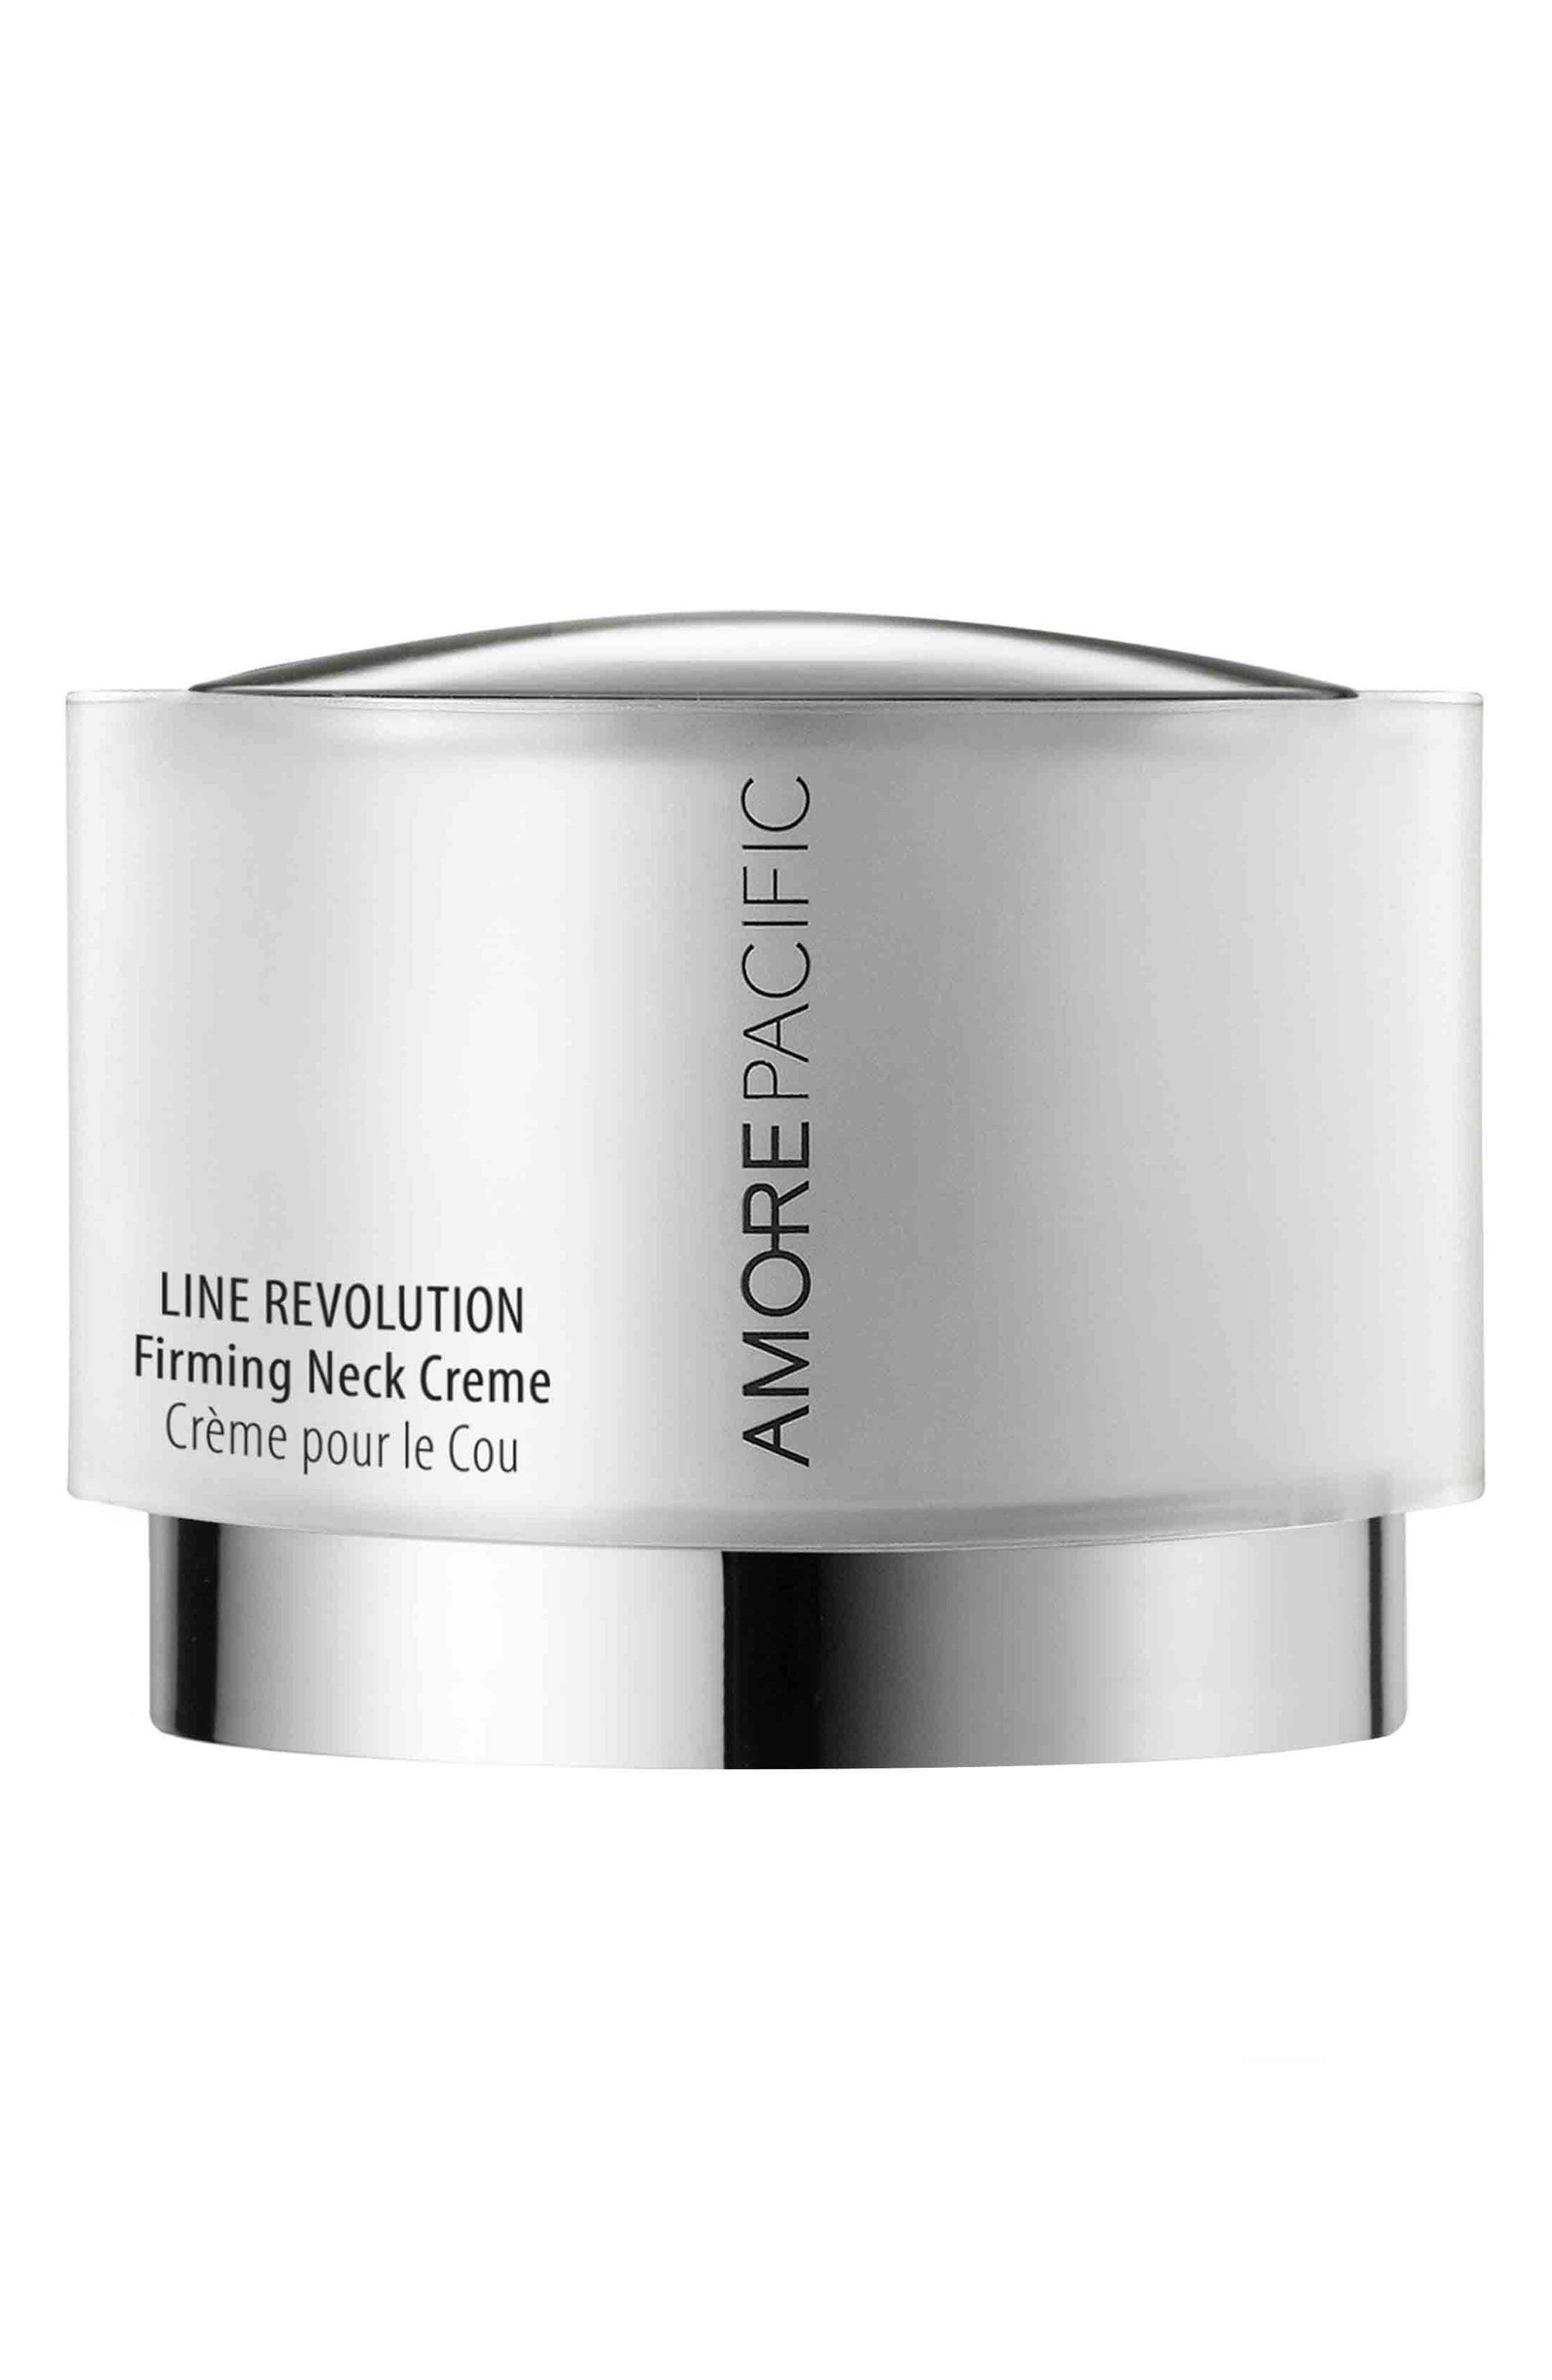 'Line Revolution' Firming Neck Crème,                         Main,                         color, NO COLOR